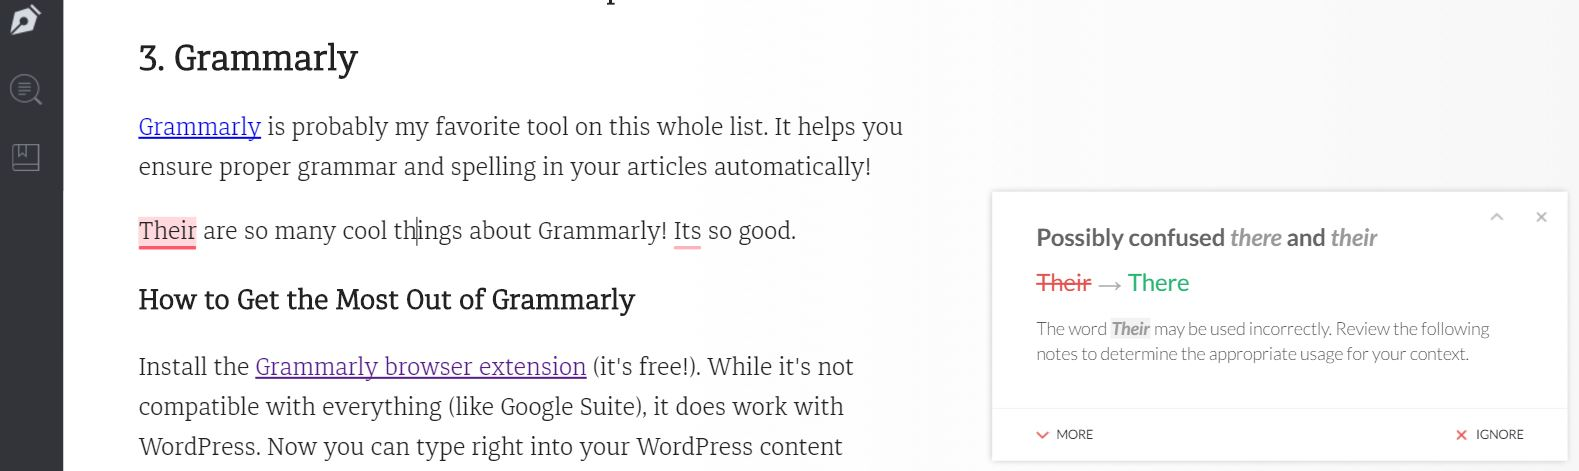 Blogging Tool #3: Grammarly